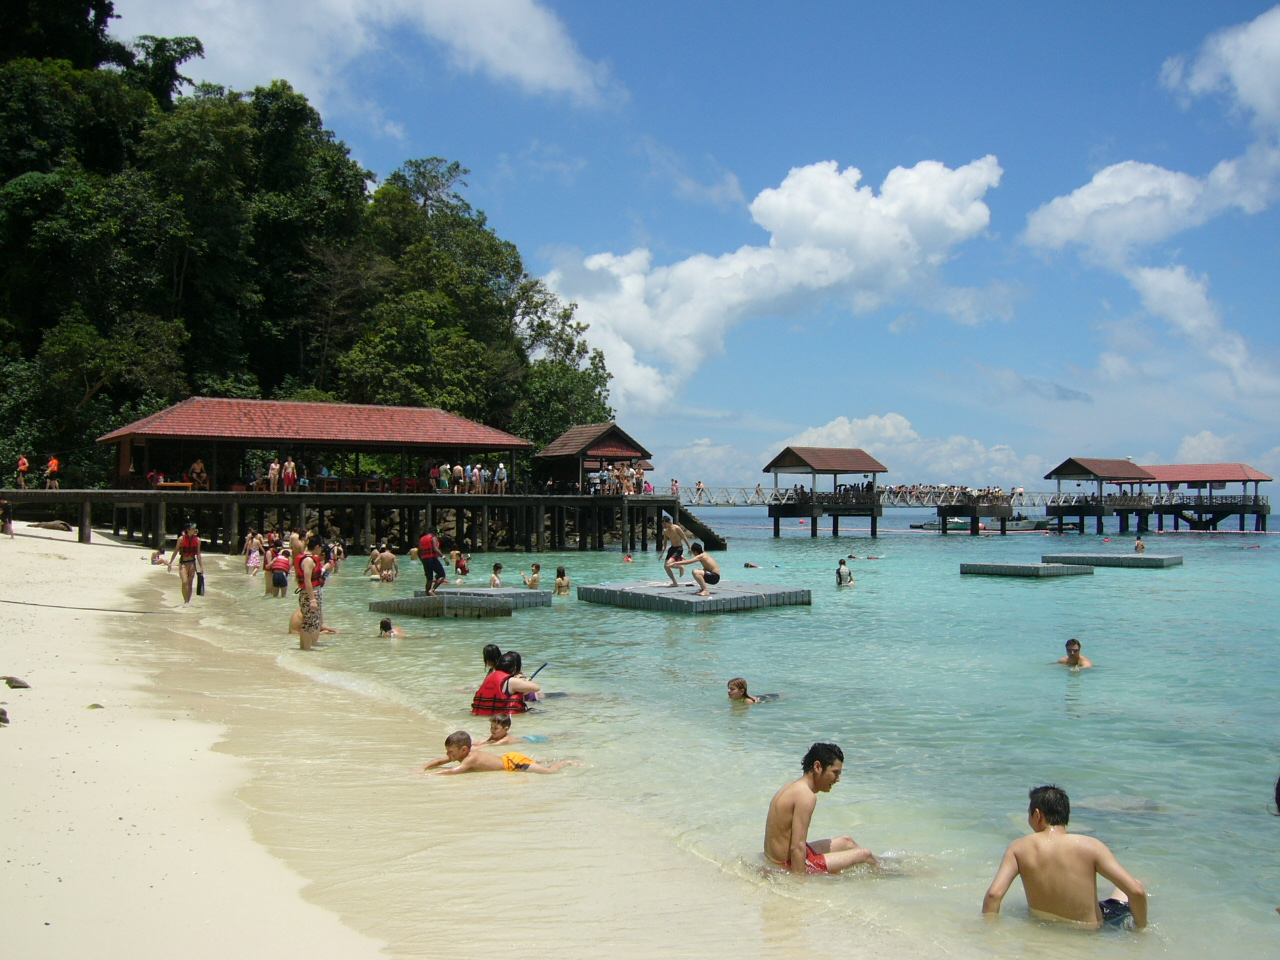 Malaysia Pulau Payar